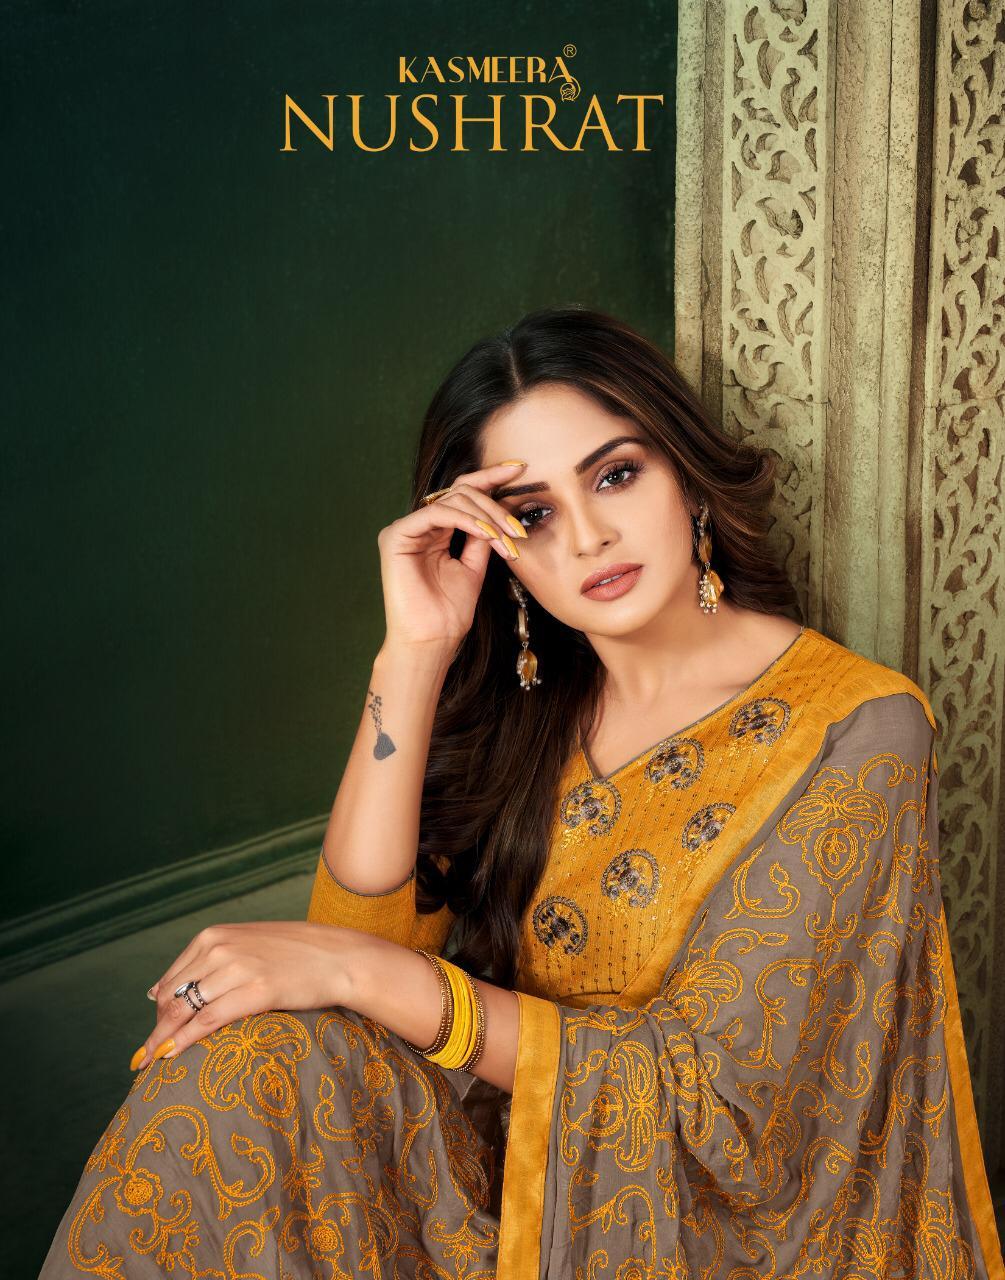 Kayce Kasmeera Nushrat Salwar Suit Wholesale Catalog 12 Pcs 1 - Kayce Kasmeera Nushrat Salwar Suit Wholesale Catalog 12 Pcs